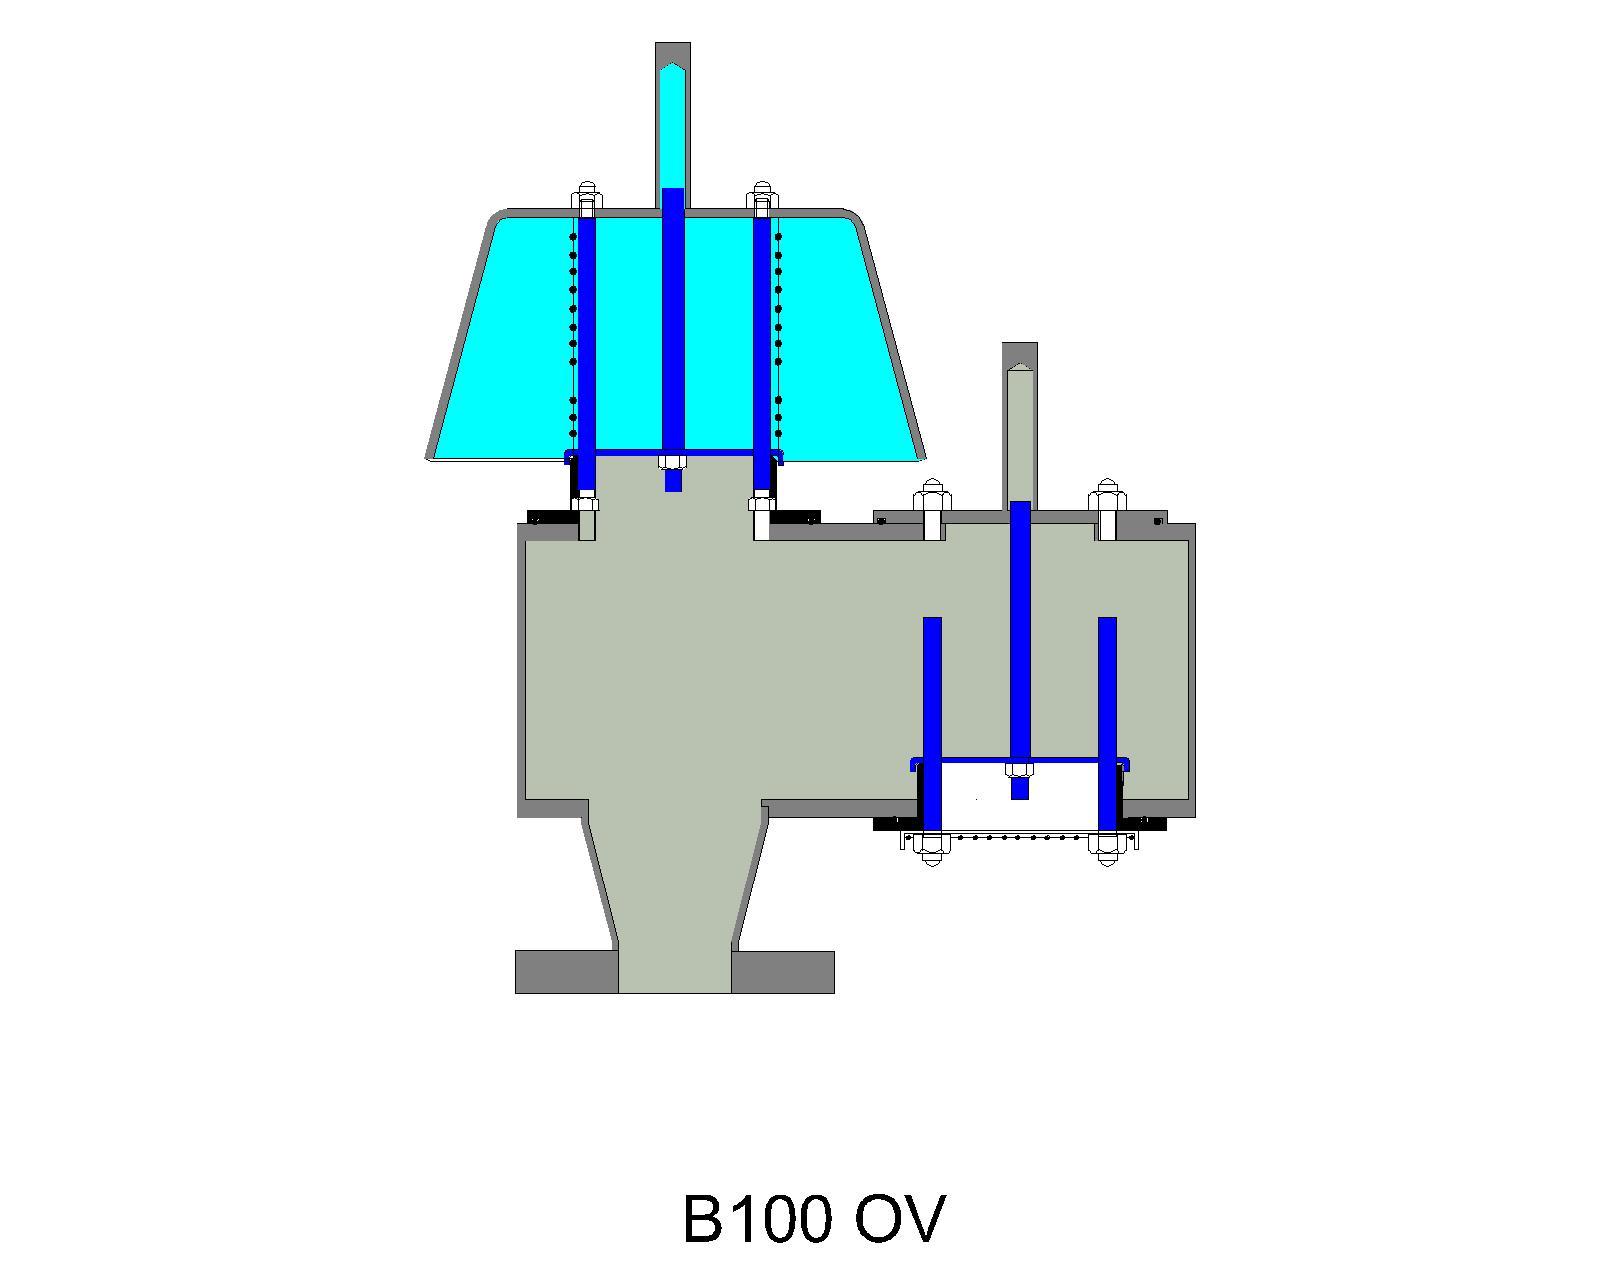 B100 open vent pressure relief valve